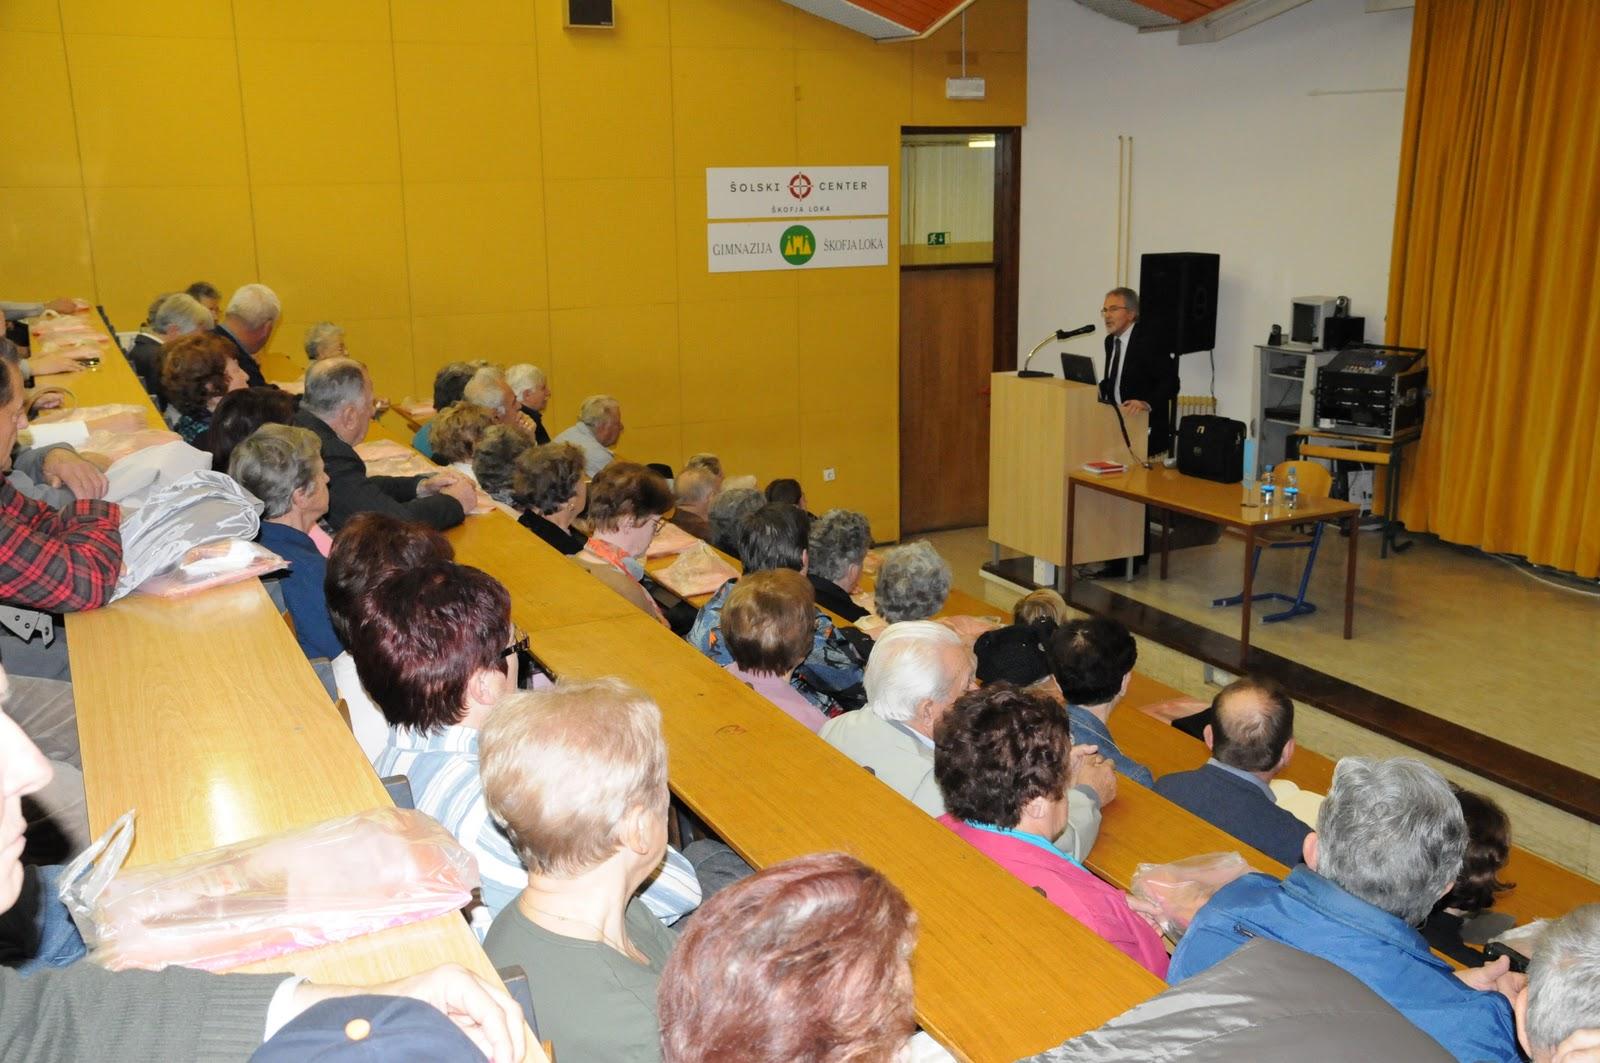 Predavanje, dr. Camlek - oktober 2011 - DSC_3867.JPG